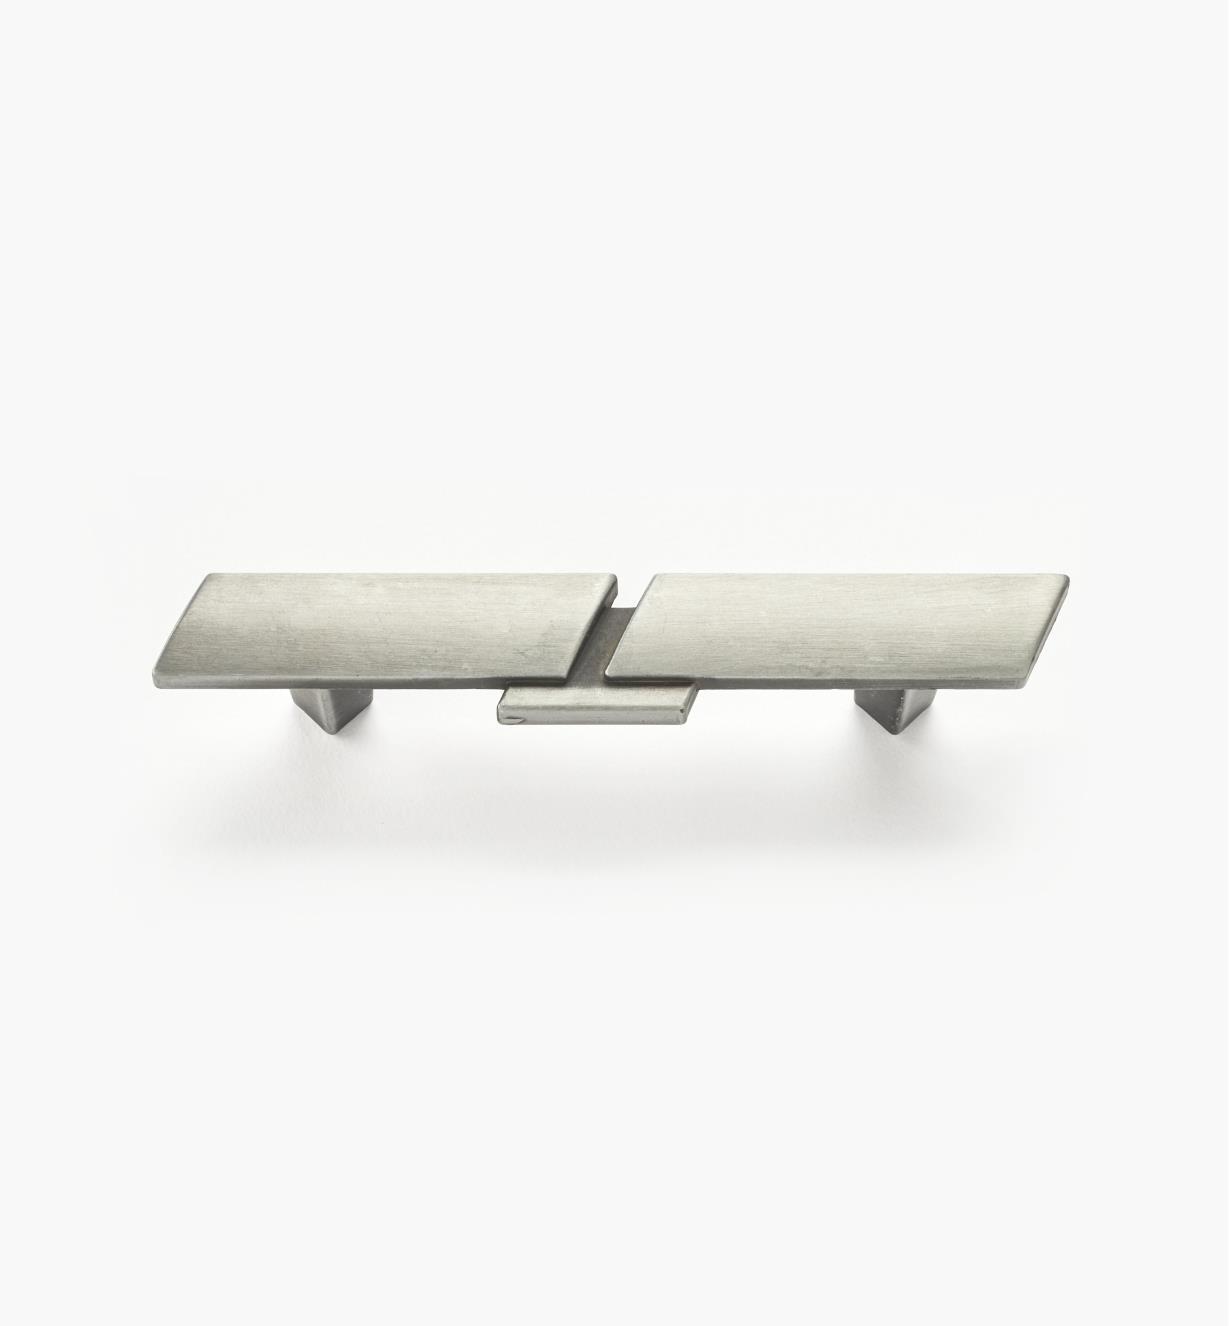 "01W4932 - 4 3/4"" Steel Handle"